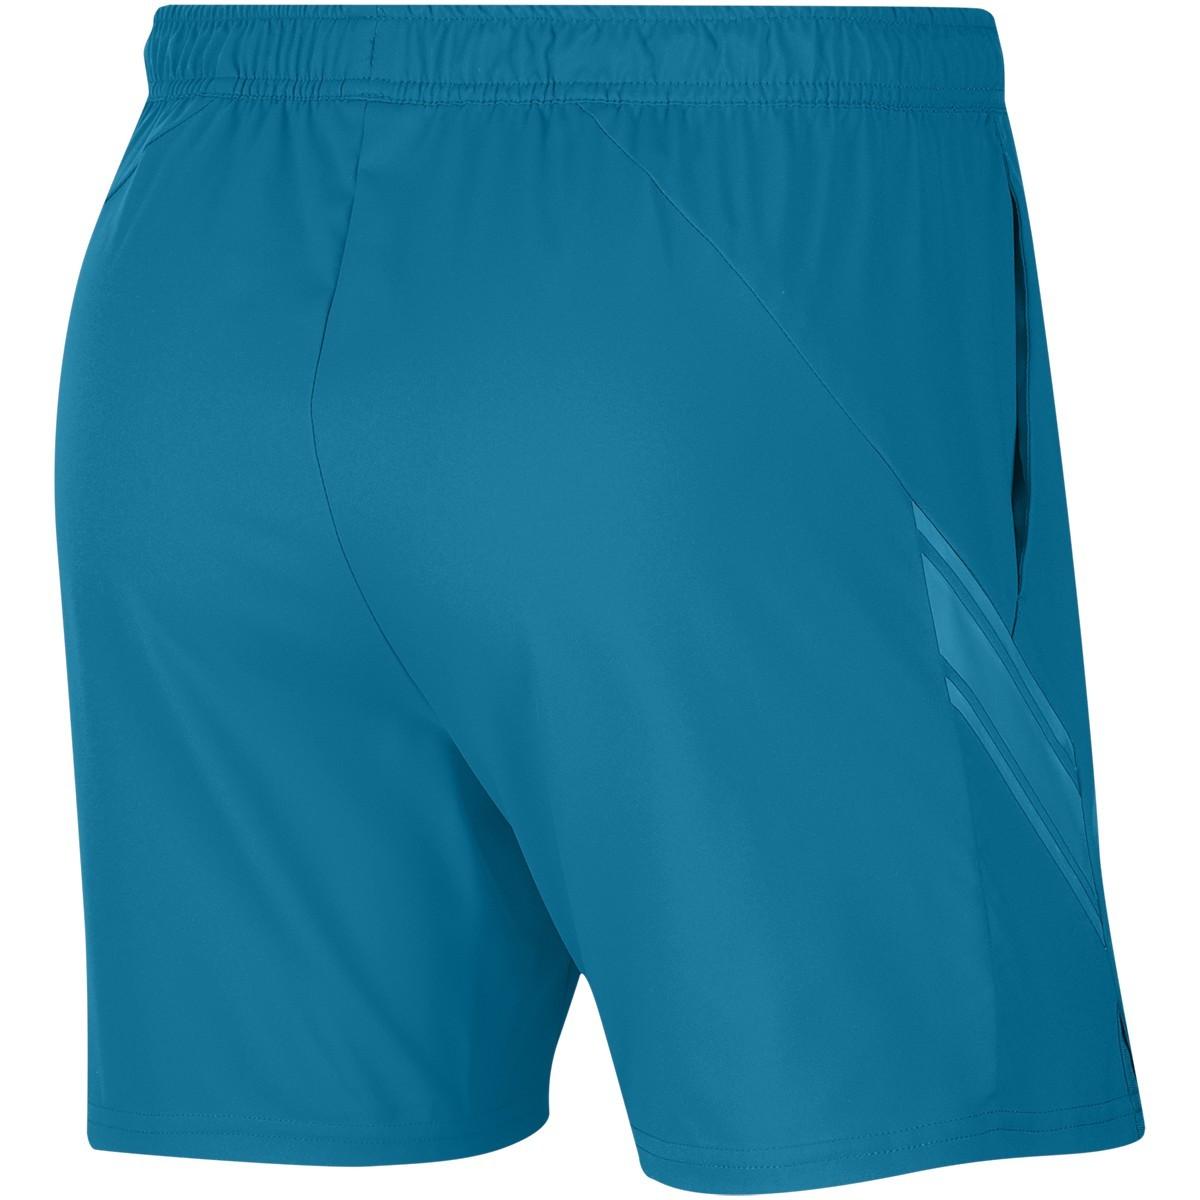 Теннисные шорты мужские Nike Court Dry 7in Short neo turquoise